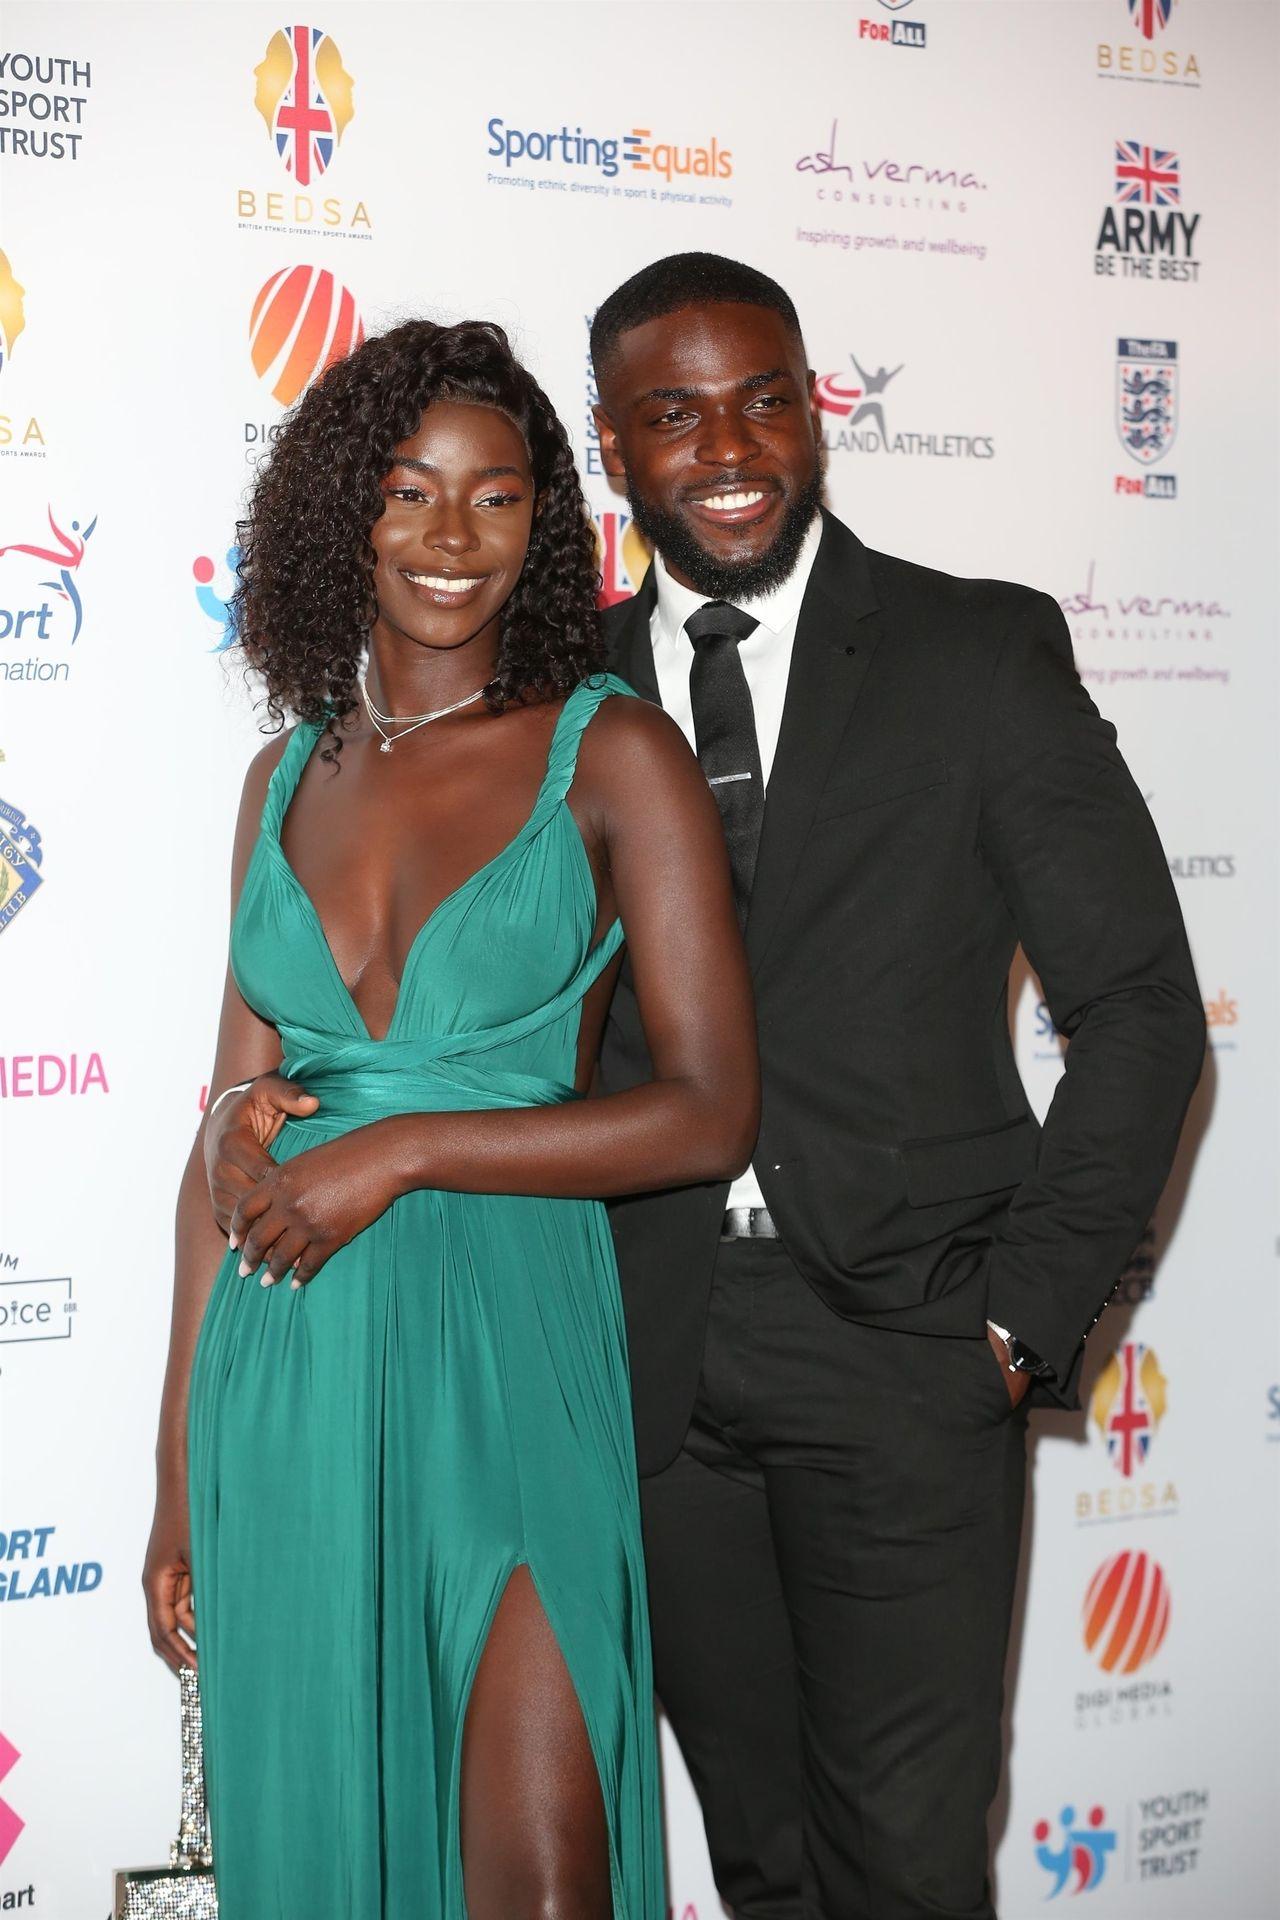 Mike Boateng & Priscilla Anyabu Are Seen At British Ethnic Diversity Sports Awards 0040